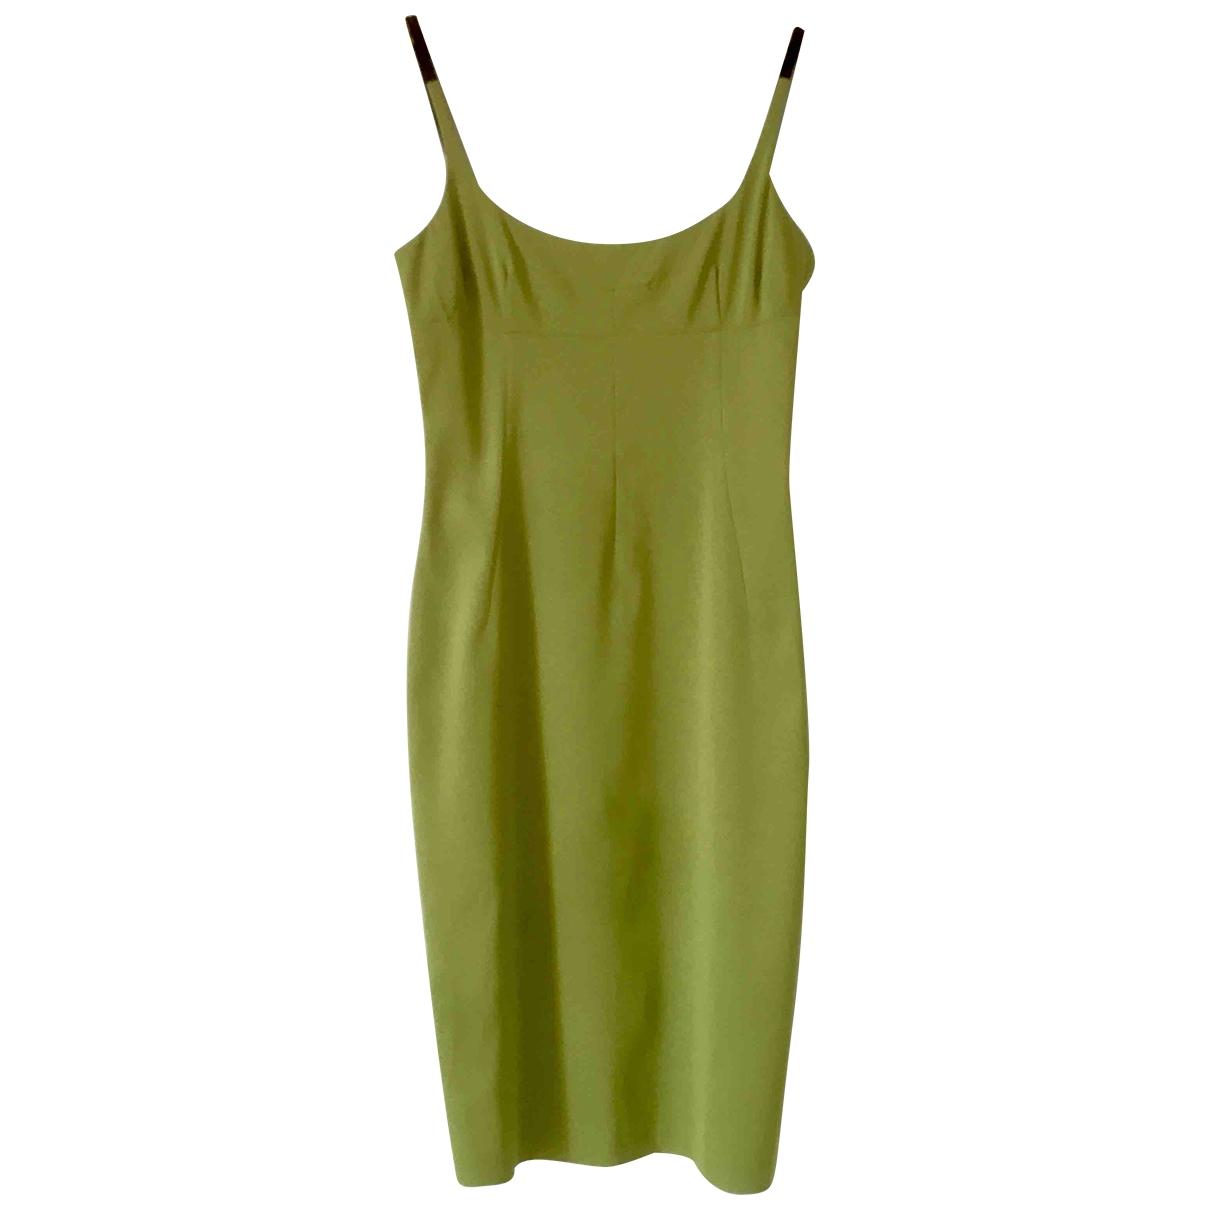 Dolce & Gabbana \N Green dress for Women 46 IT